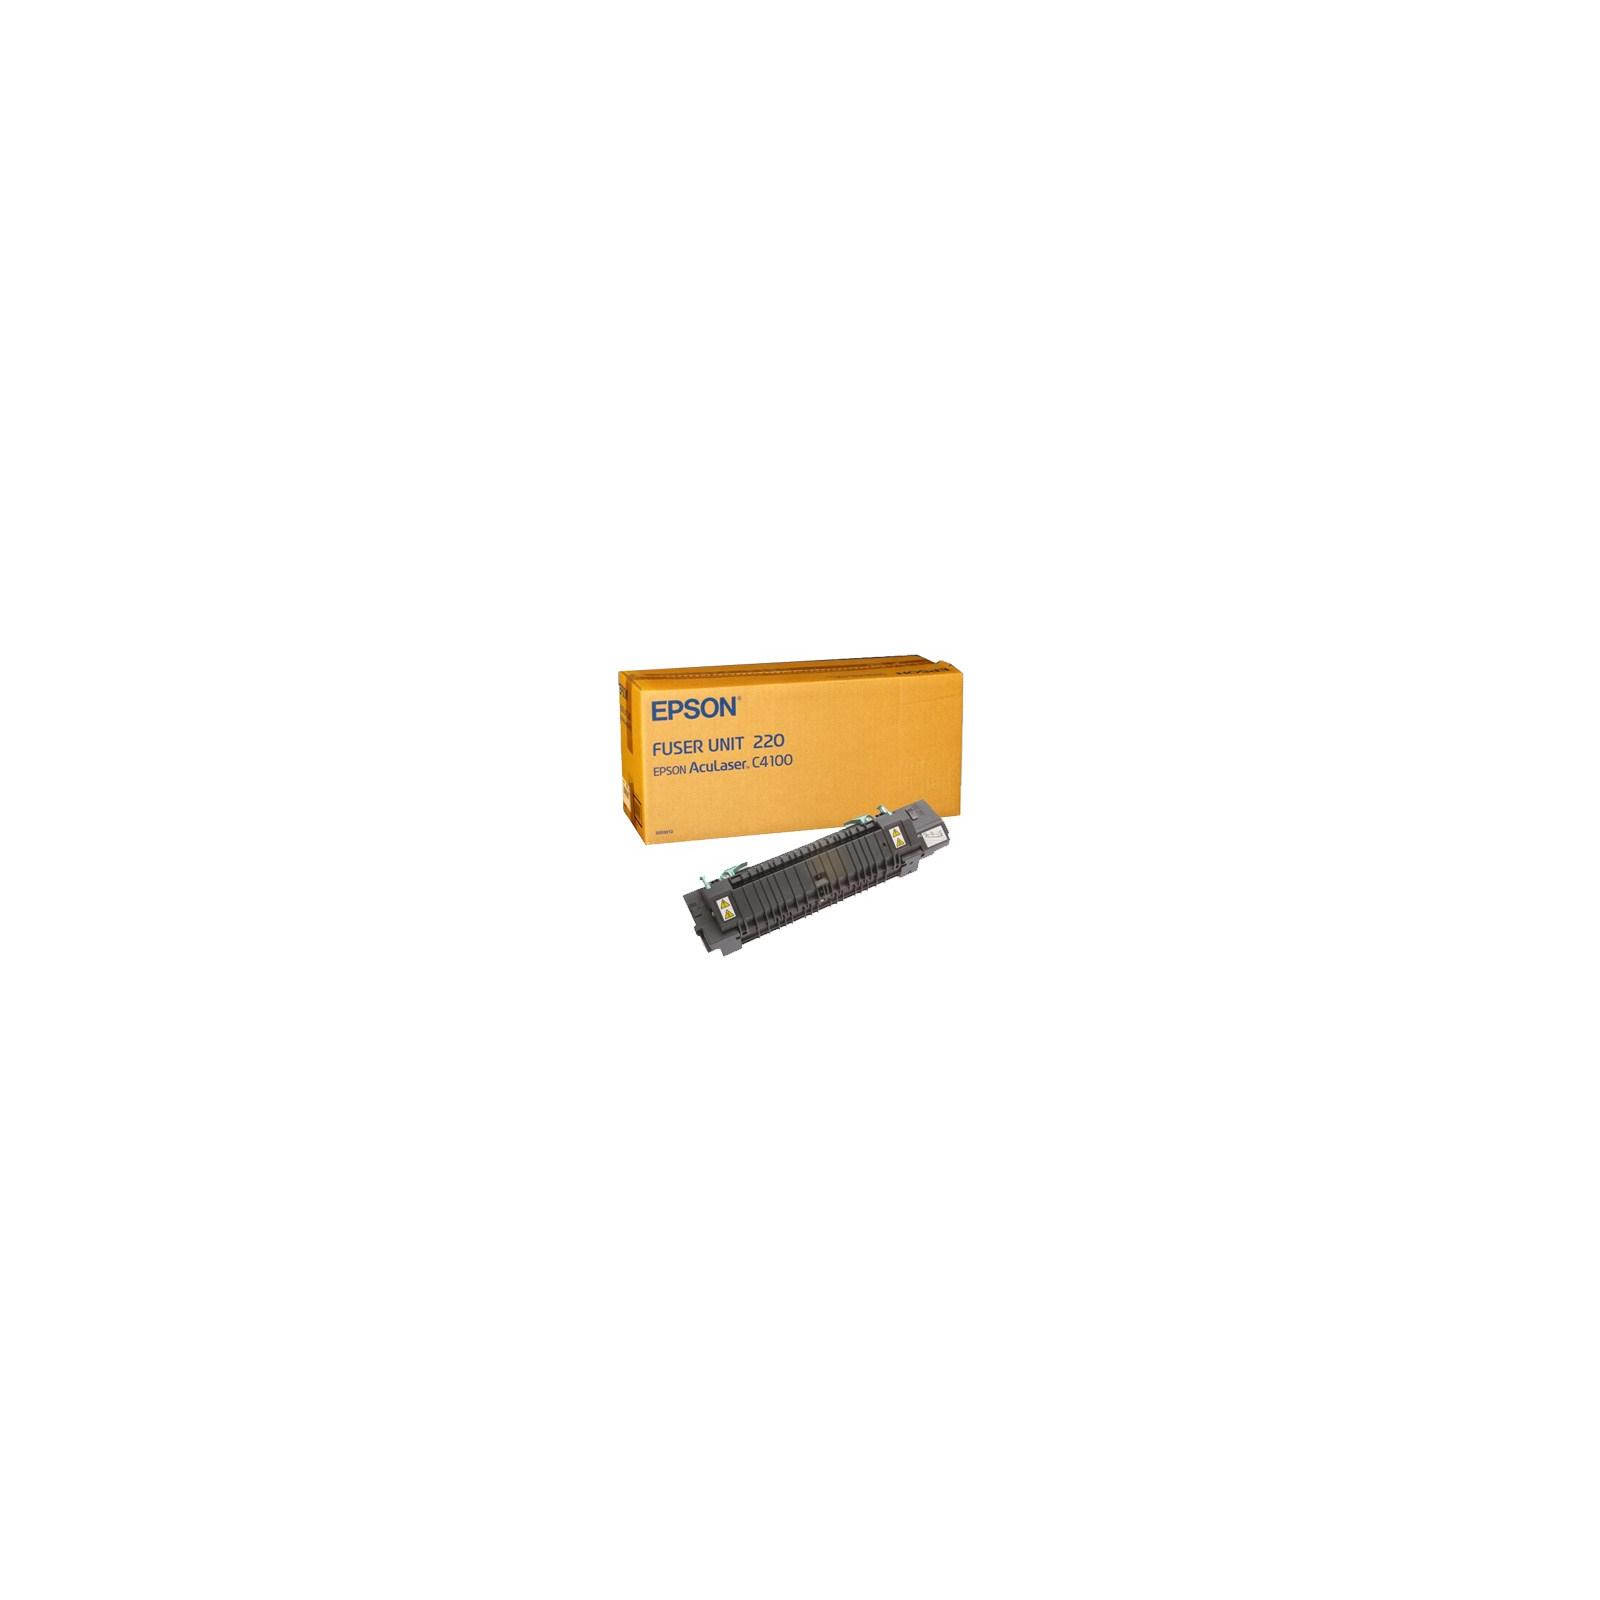 Фьюзер EPSON AcuLaser C3000/C4100 (C13S053012)